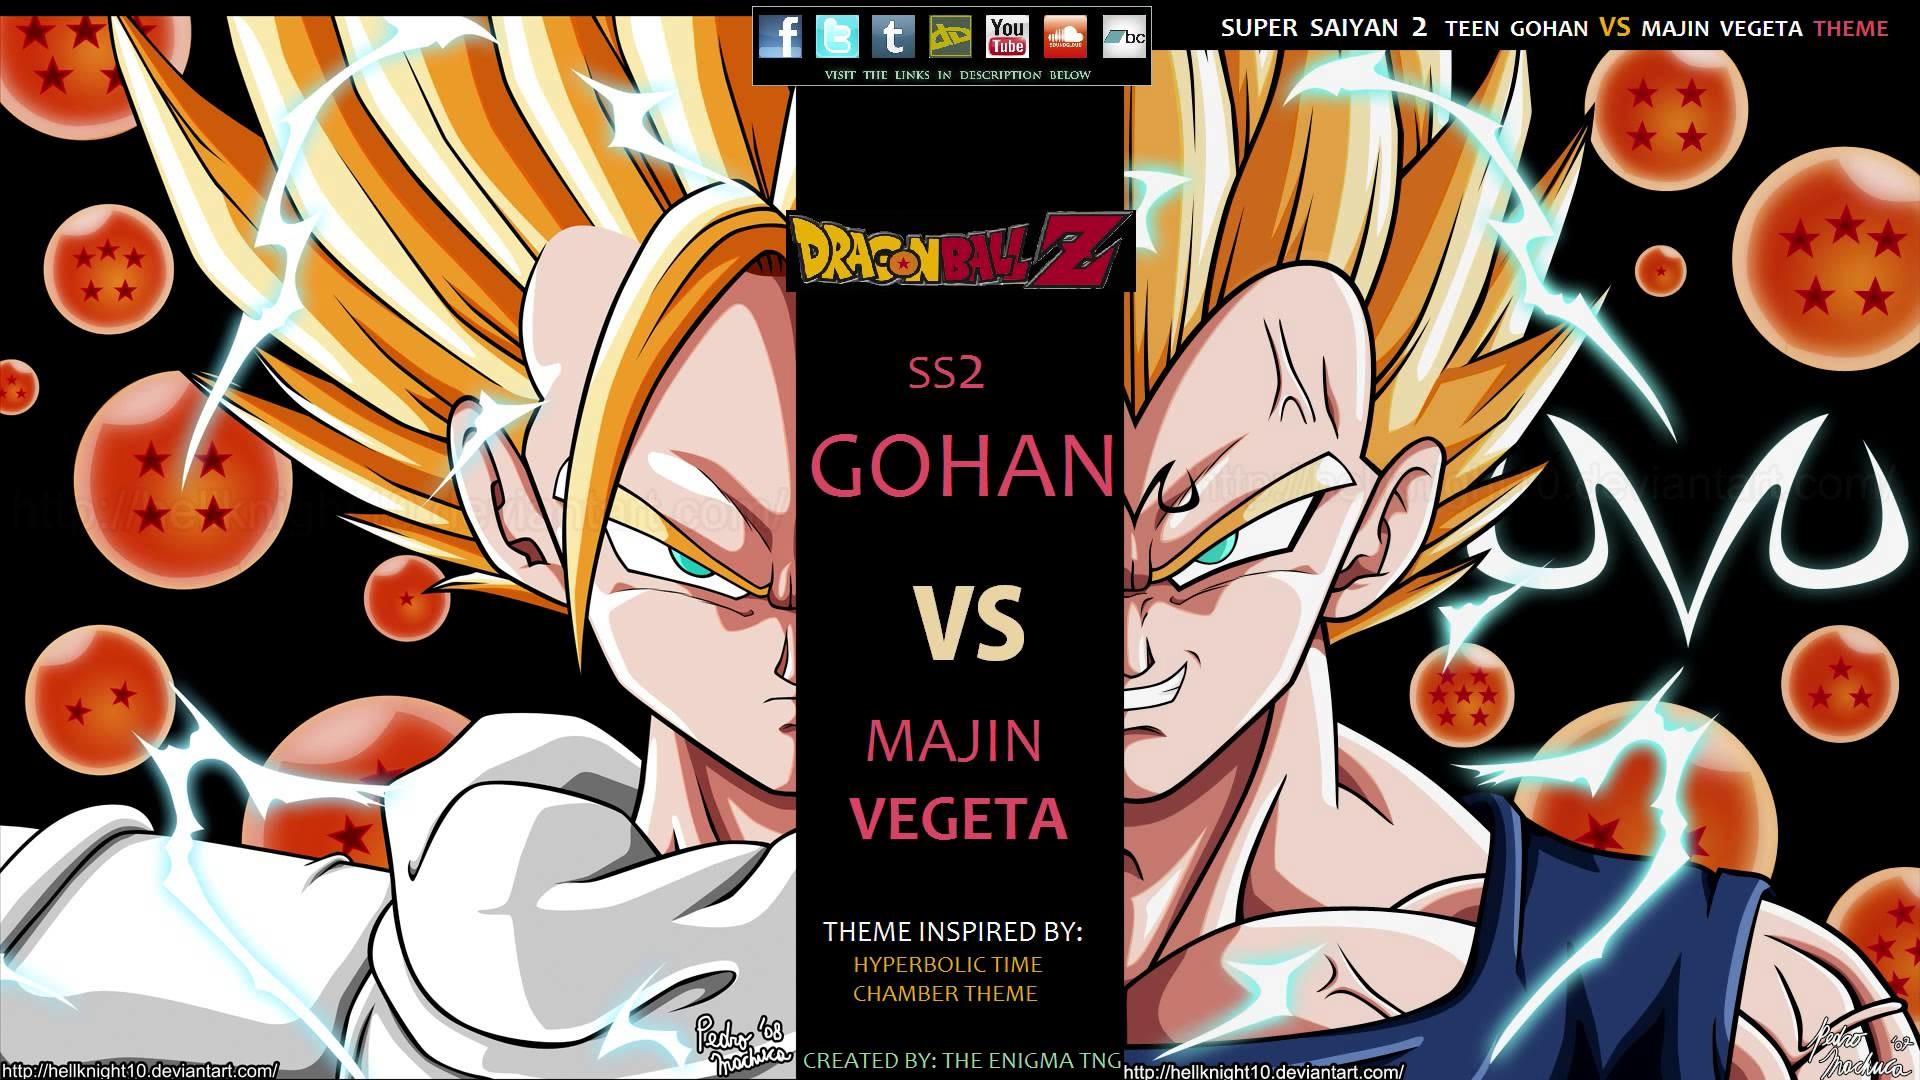 Dragon Ball Z – Super Saiyan 2 Teen Gohan VS Majin Vegeta Theme (The Enigma  TNG) – YouTube